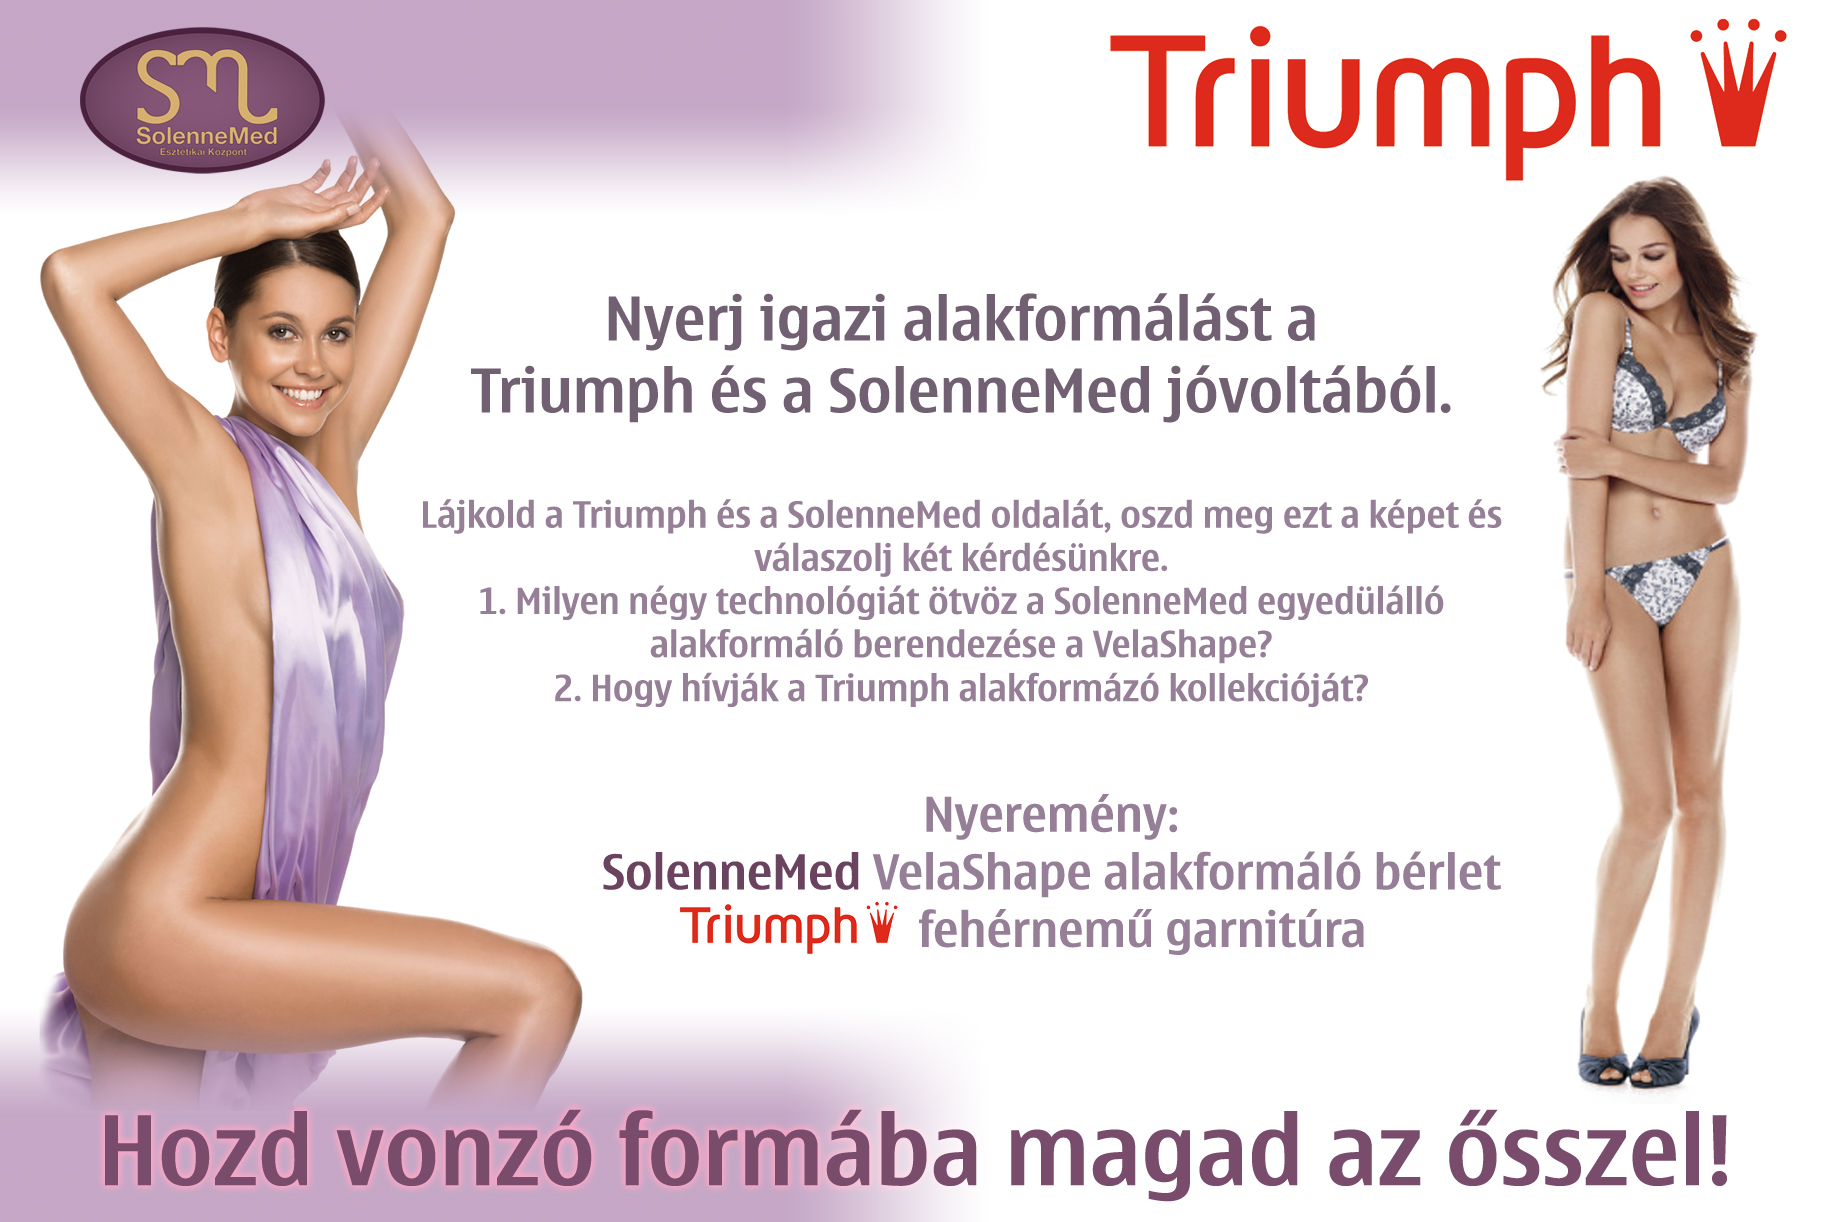 Solennemed-triumph_05.jpg